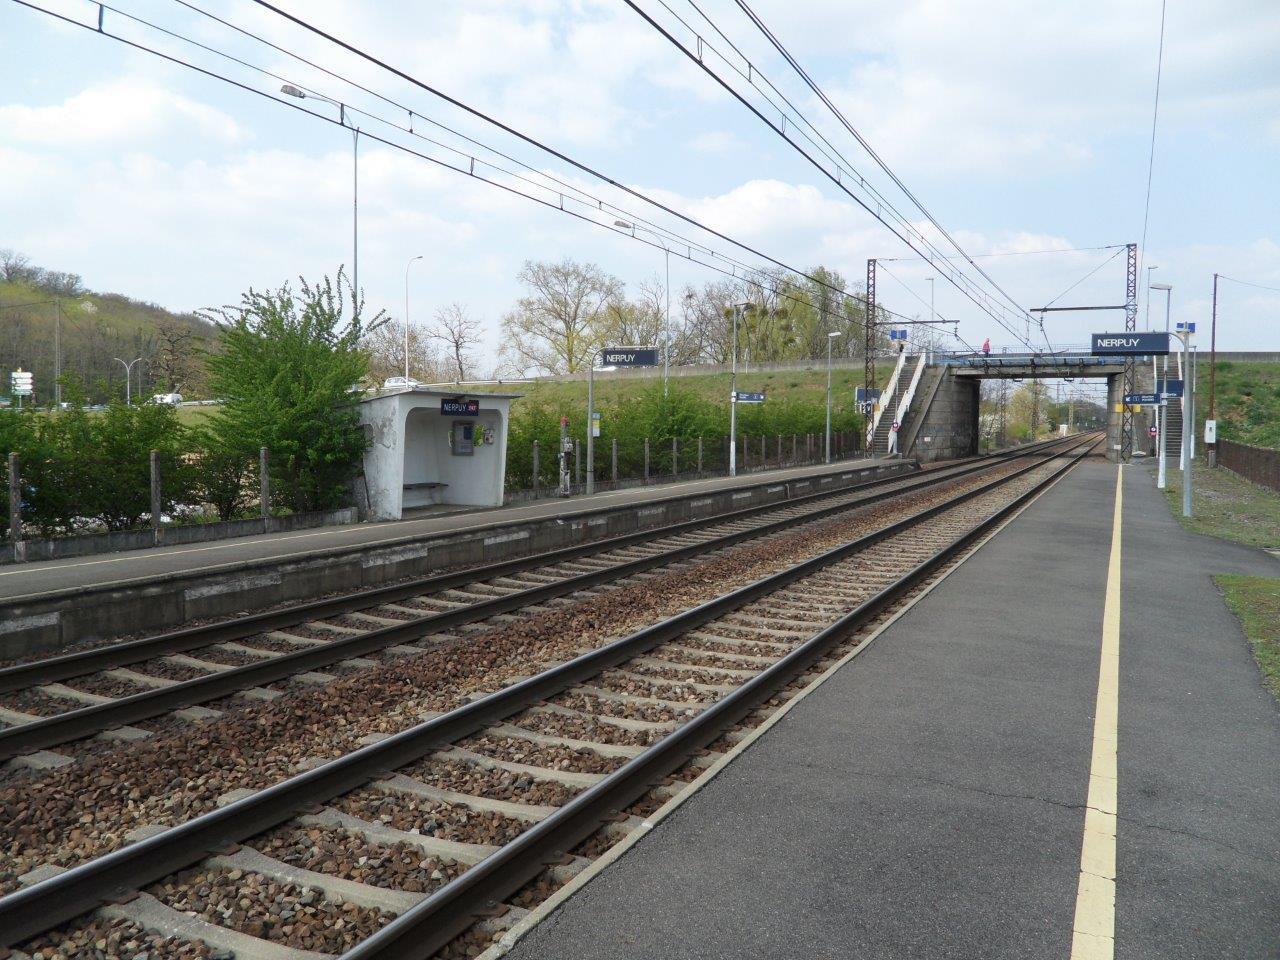 gare-de-nerpuy-train-station